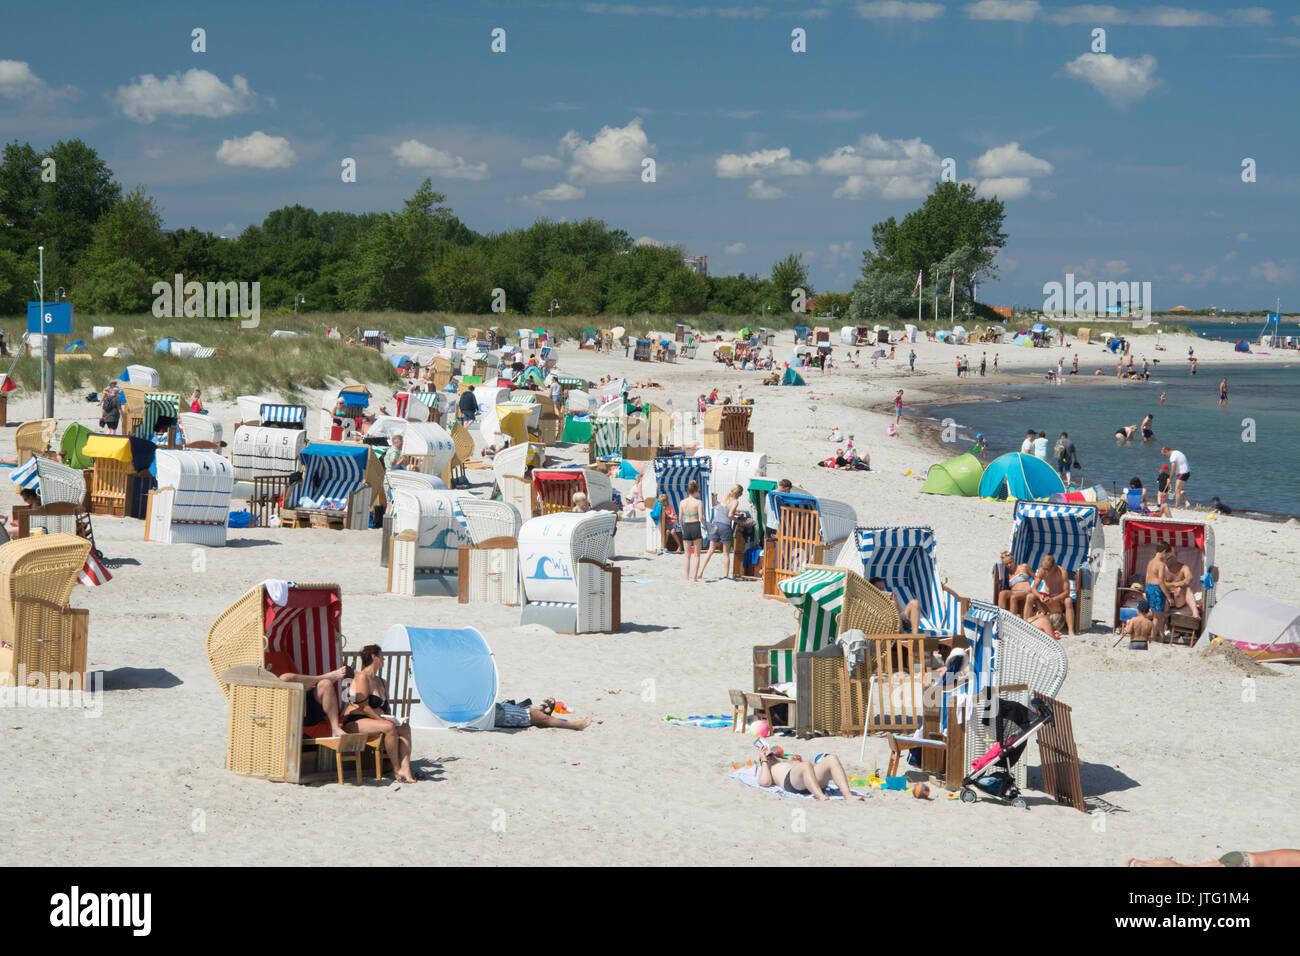 Steinwarder Beach at Heiligenhafen on the Ostsee or Baltic coast, Holstein, Germany - Stock Image